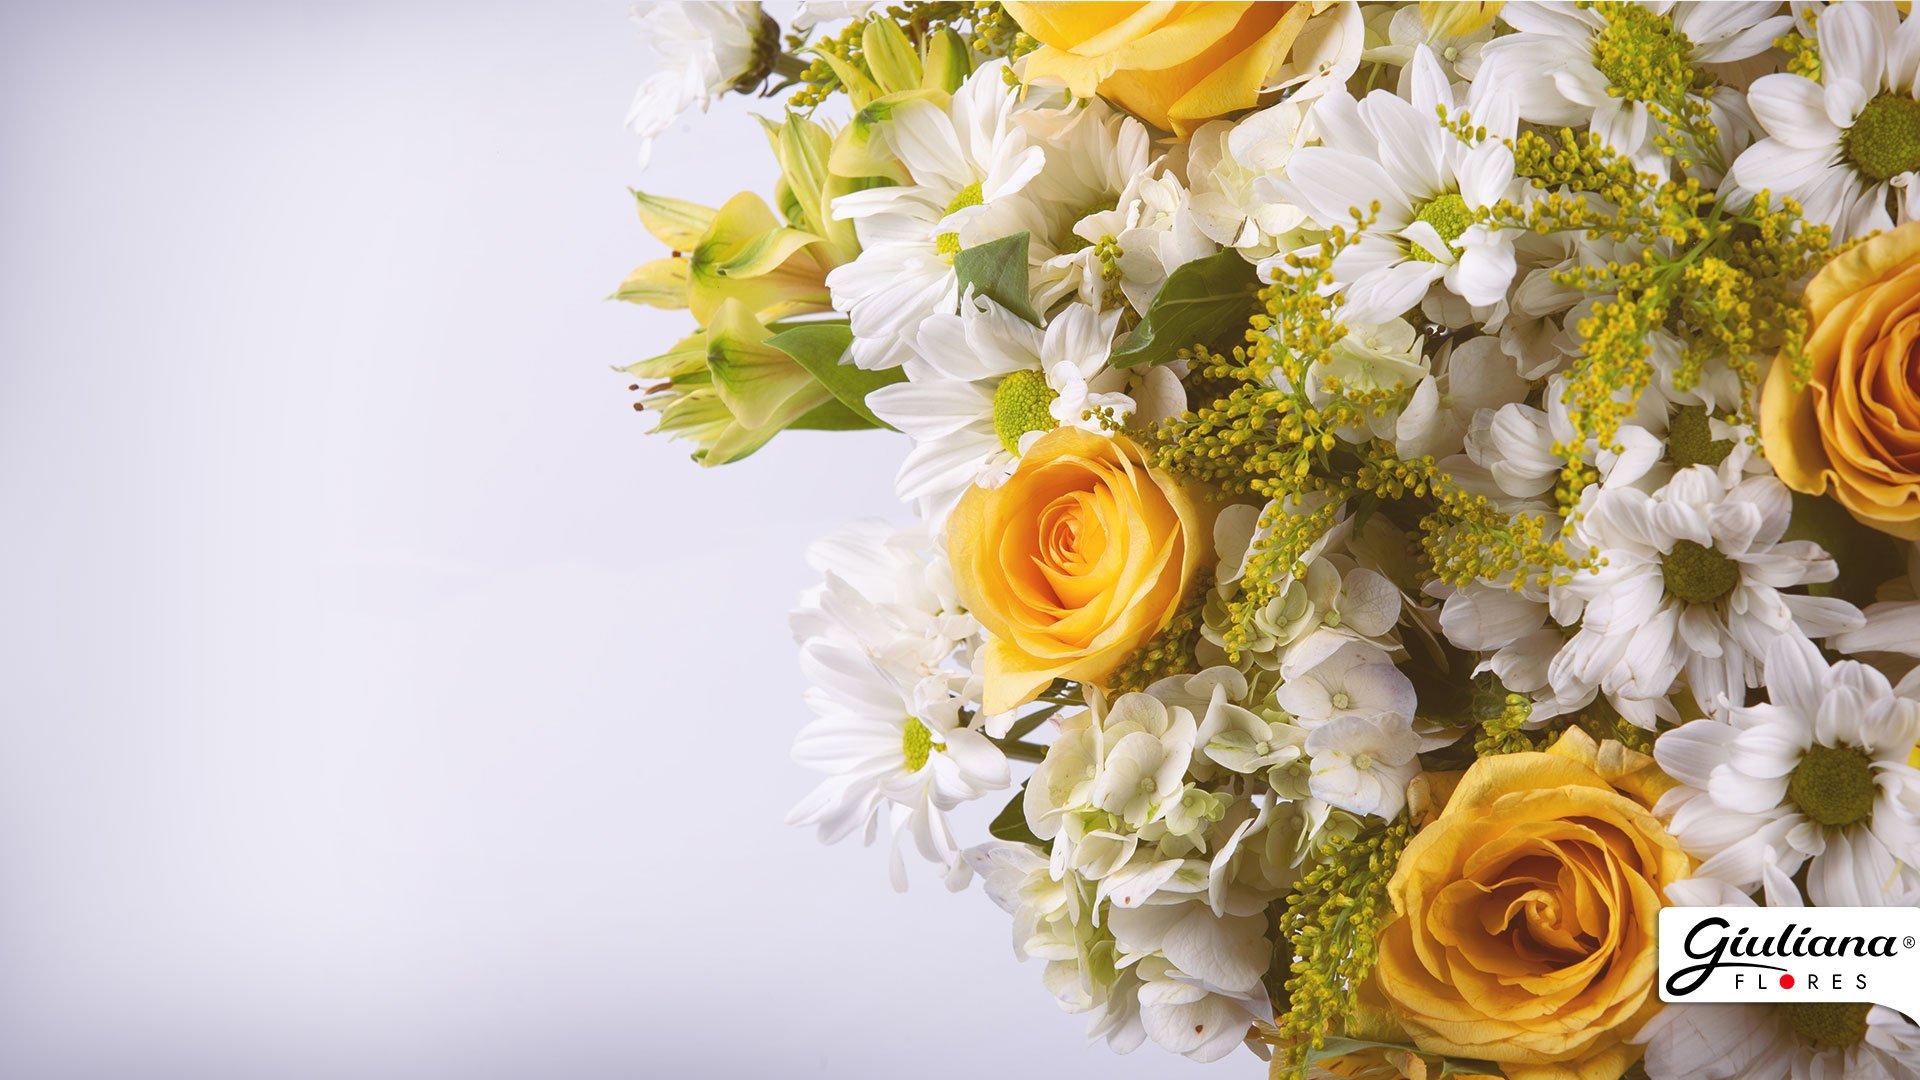 Buquê de Mix de Flores Amarelas